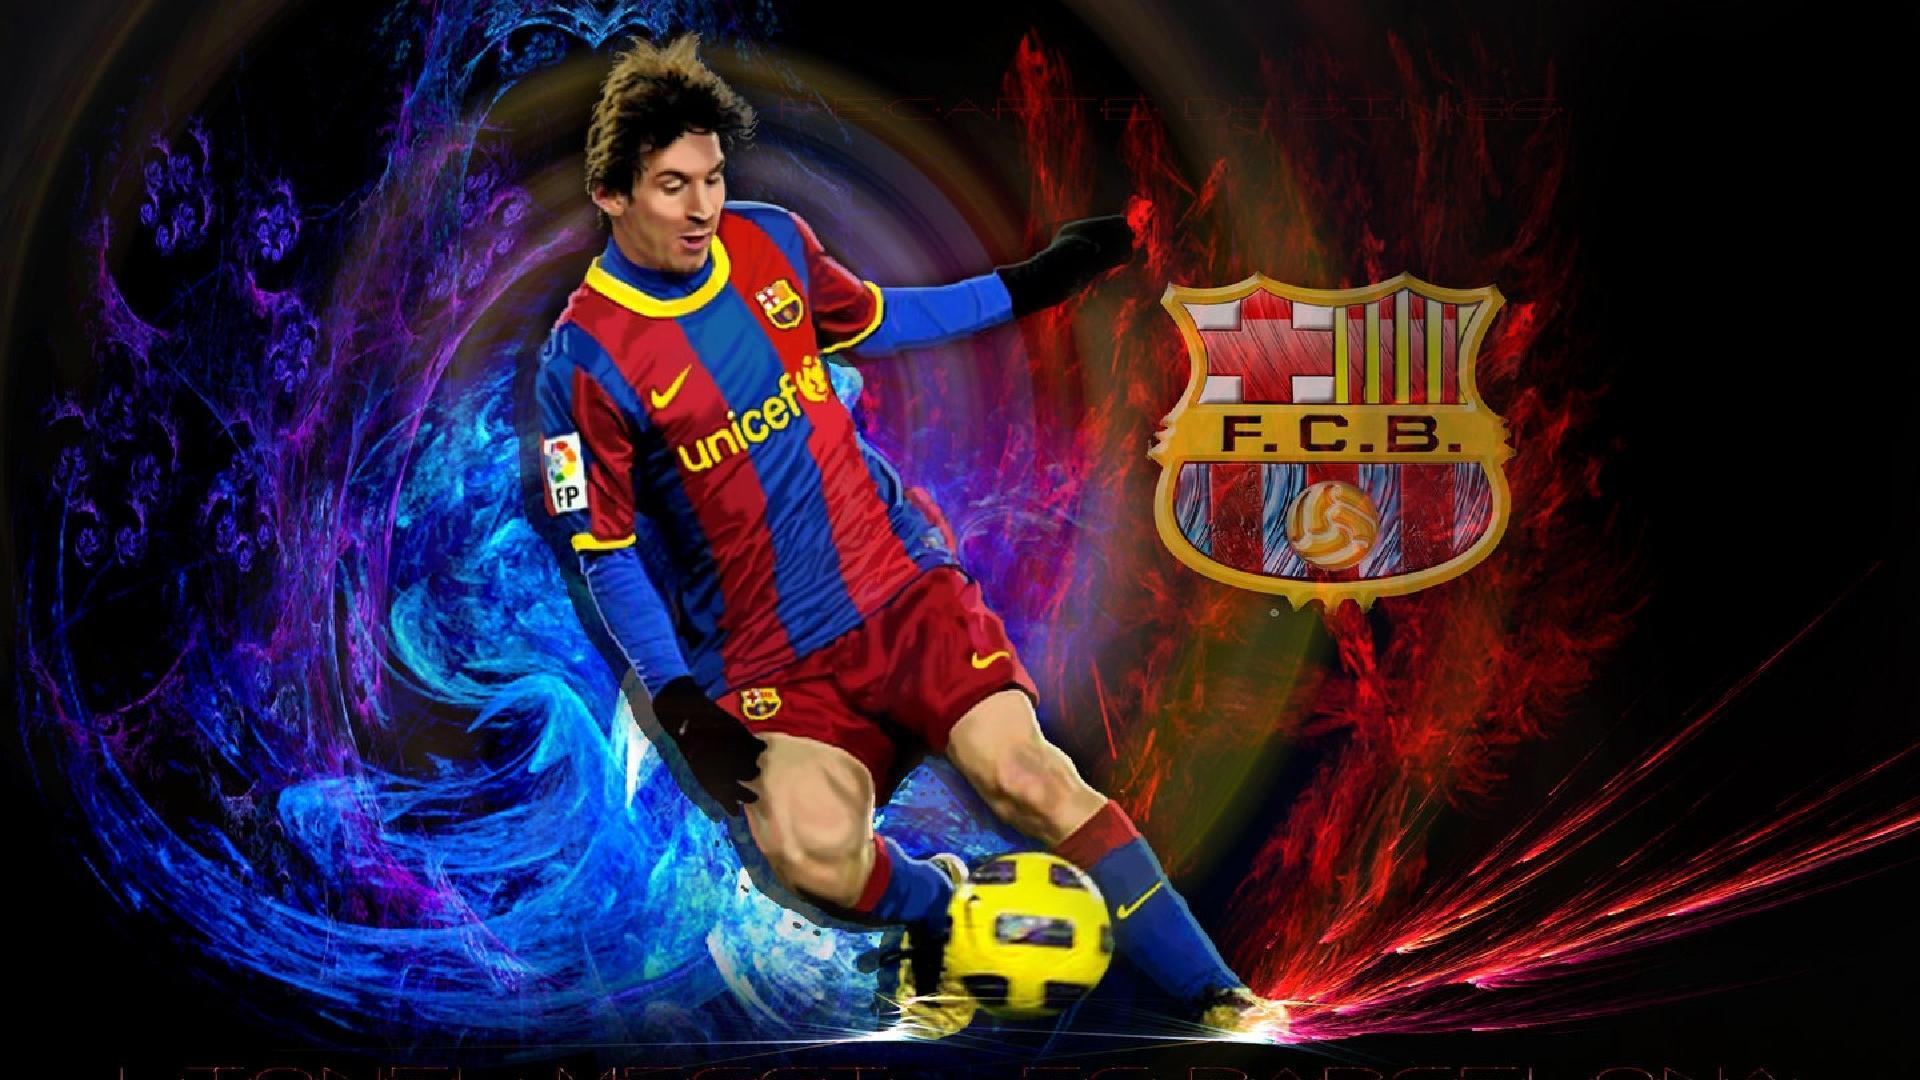 Messi Sport Club Barcelona Full HD Desktop Wallpapers 1080p 1920x1080